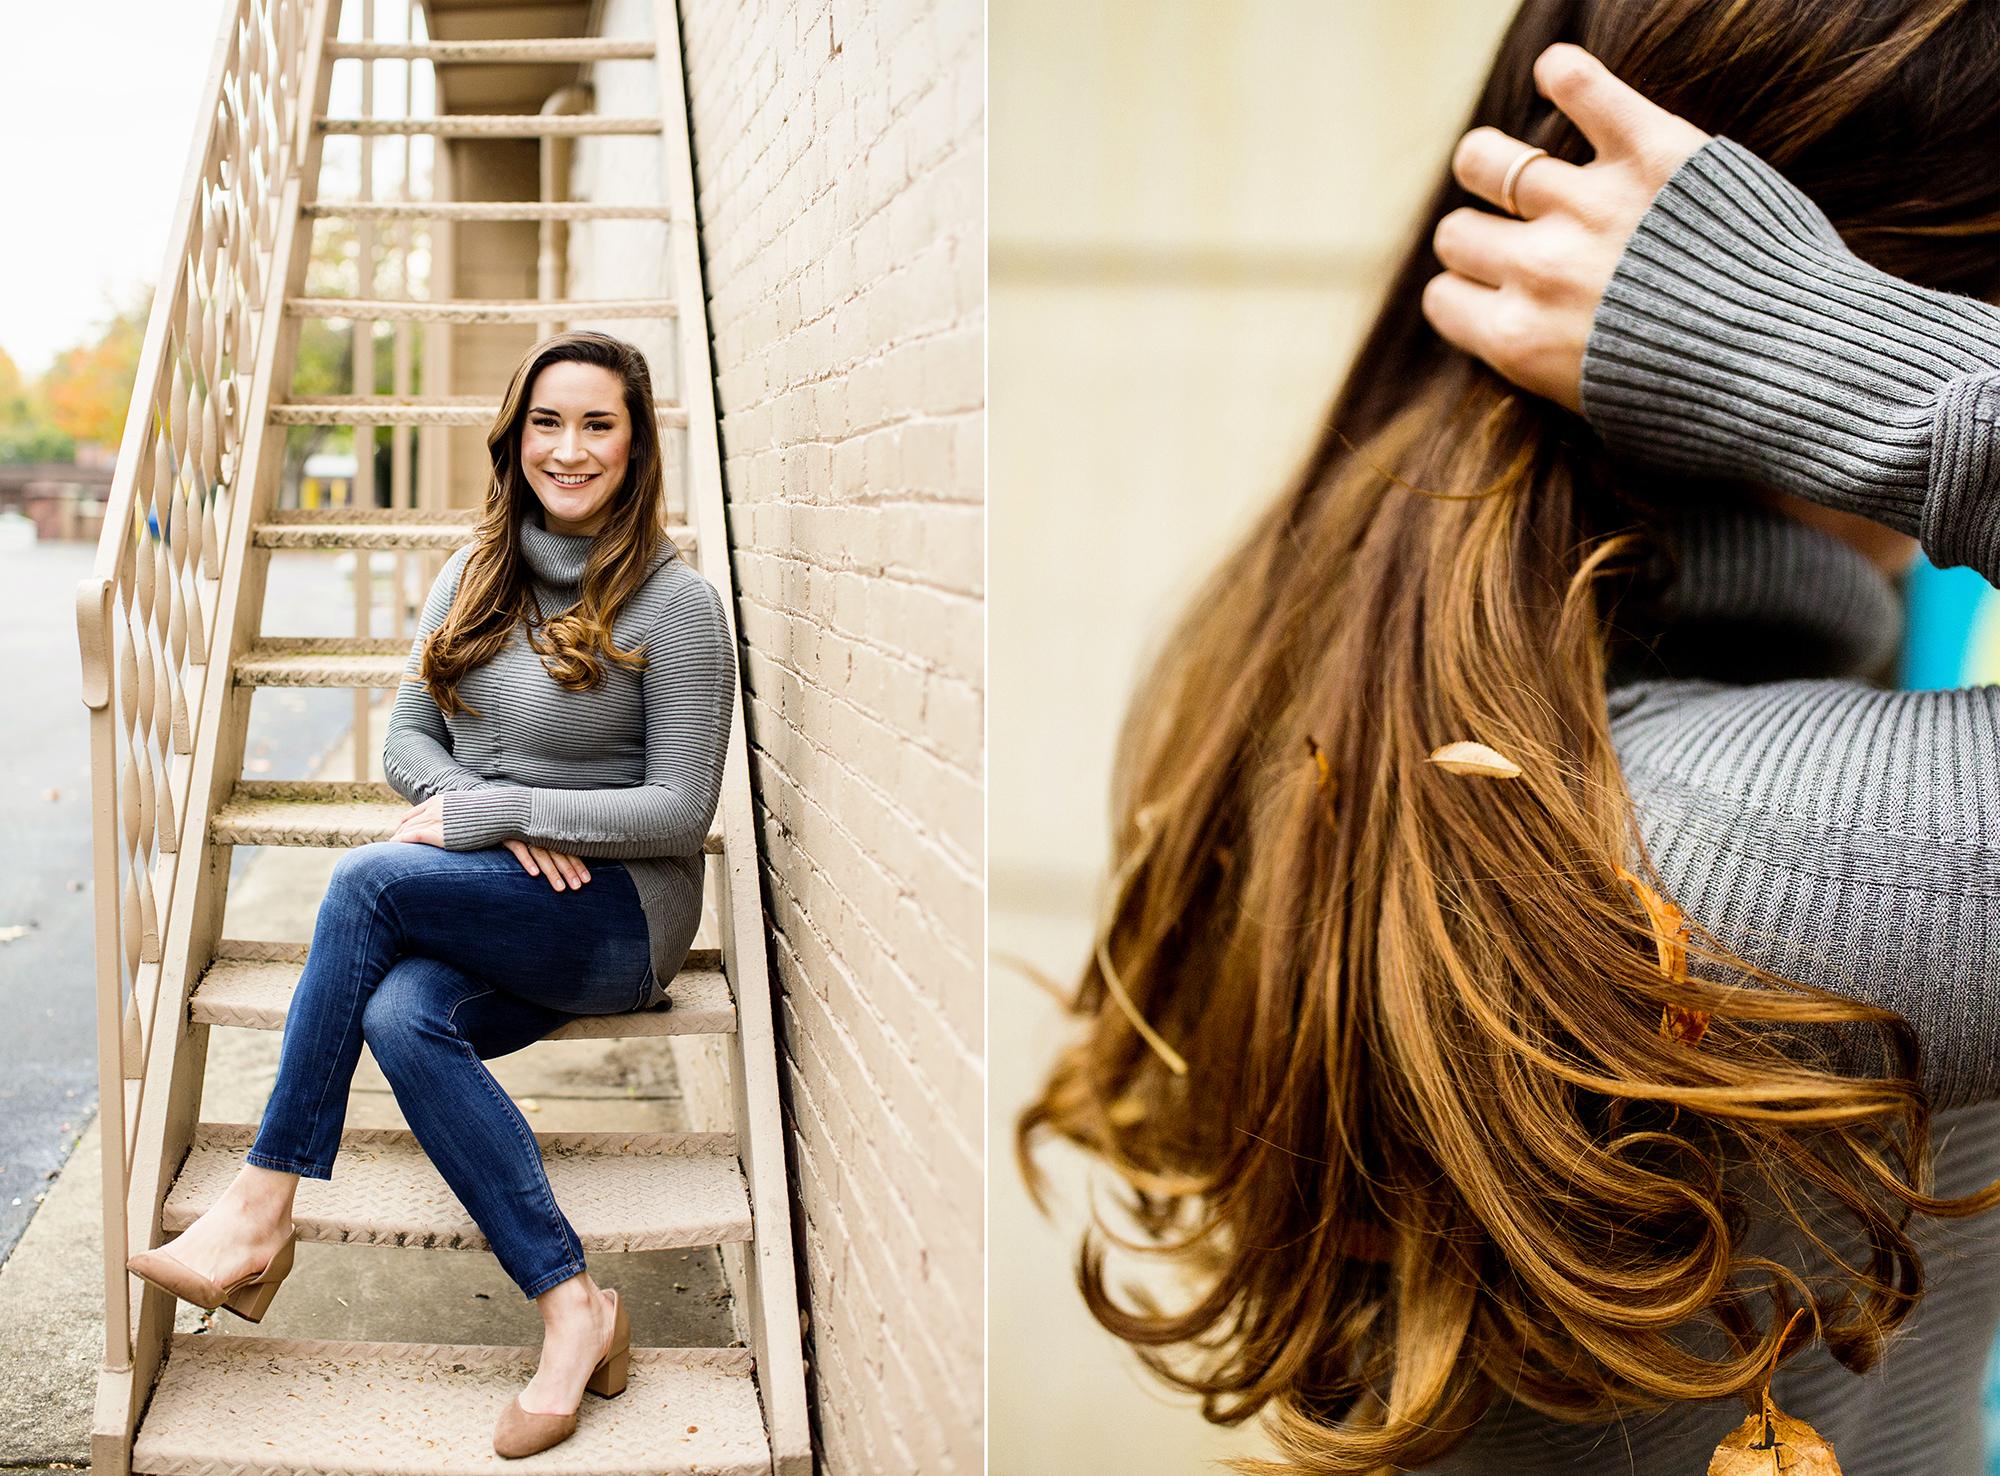 Seriously_Sabrina_Photography_Ashland_Kentucky_Fashion_Blogger_Portraits_LaurenFannin15.jpg